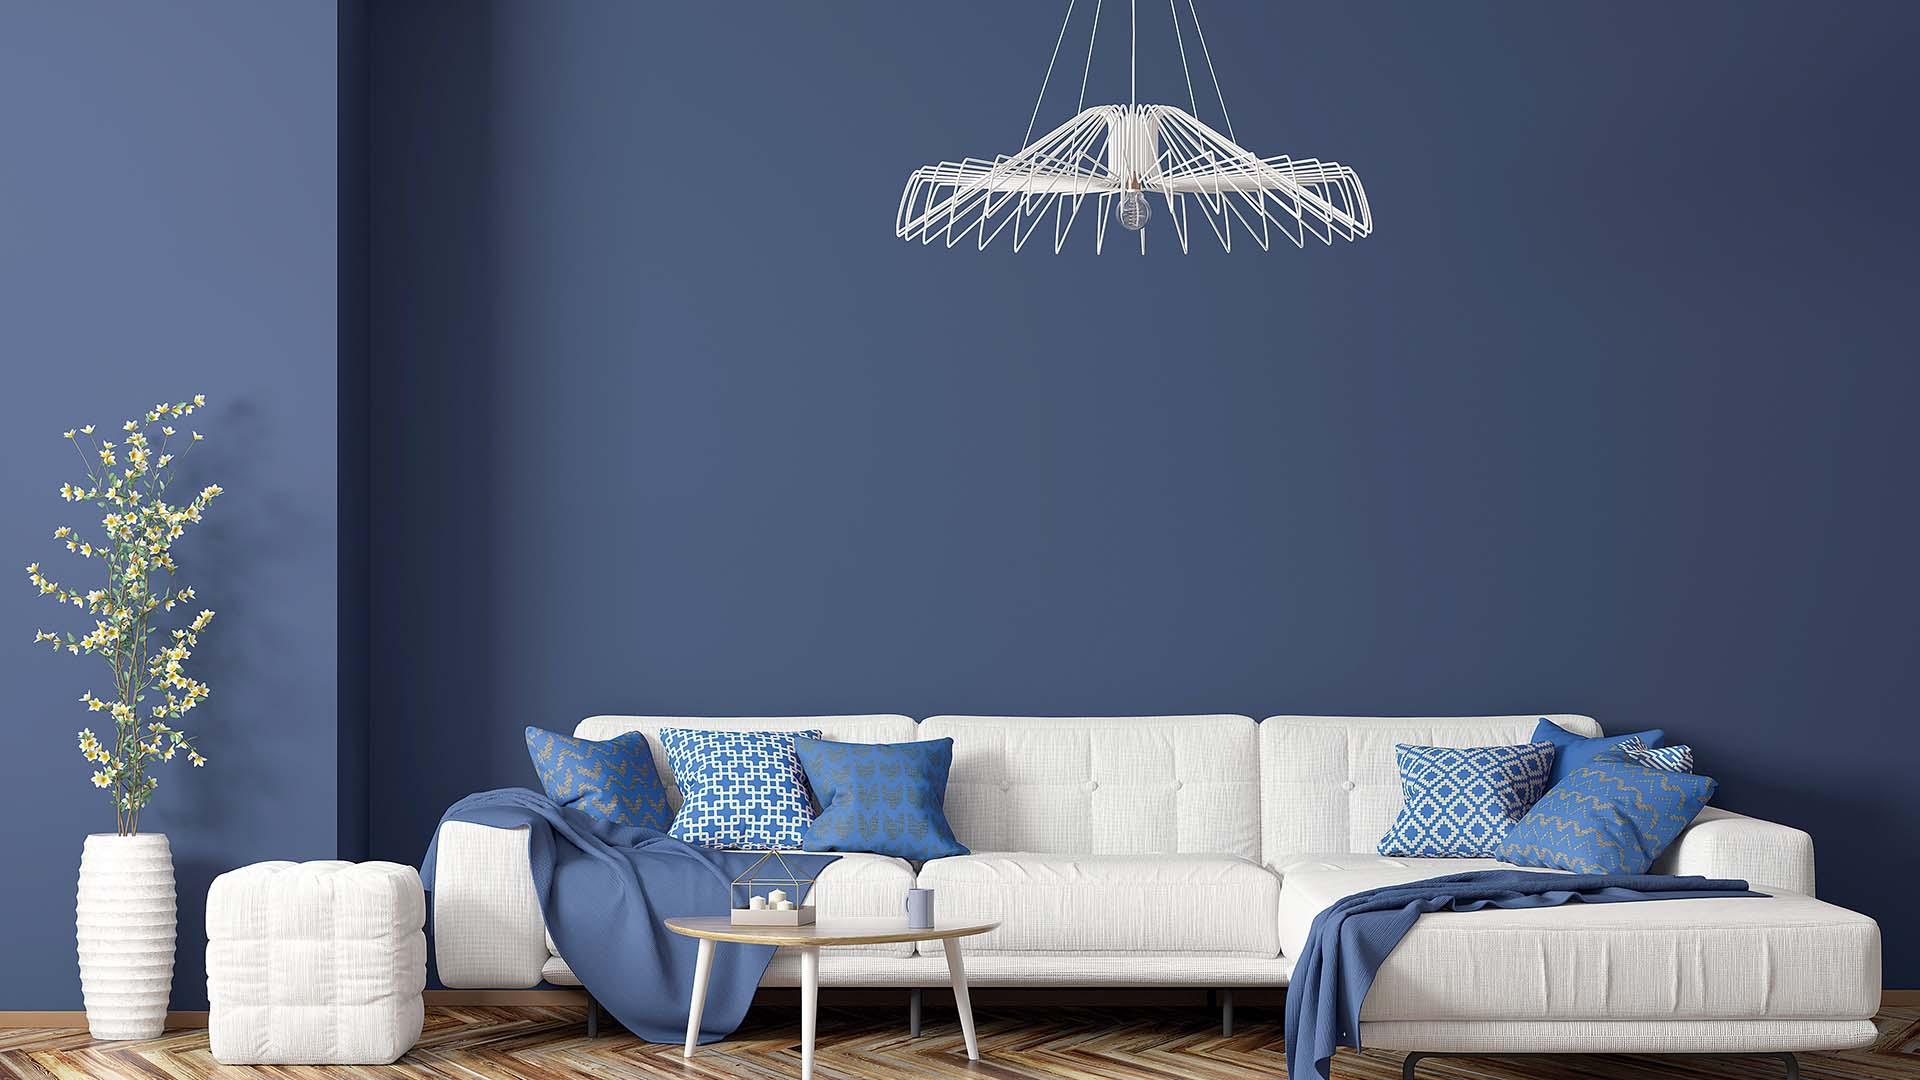 7 Interior Design Trends For 2020 Greenville Journal